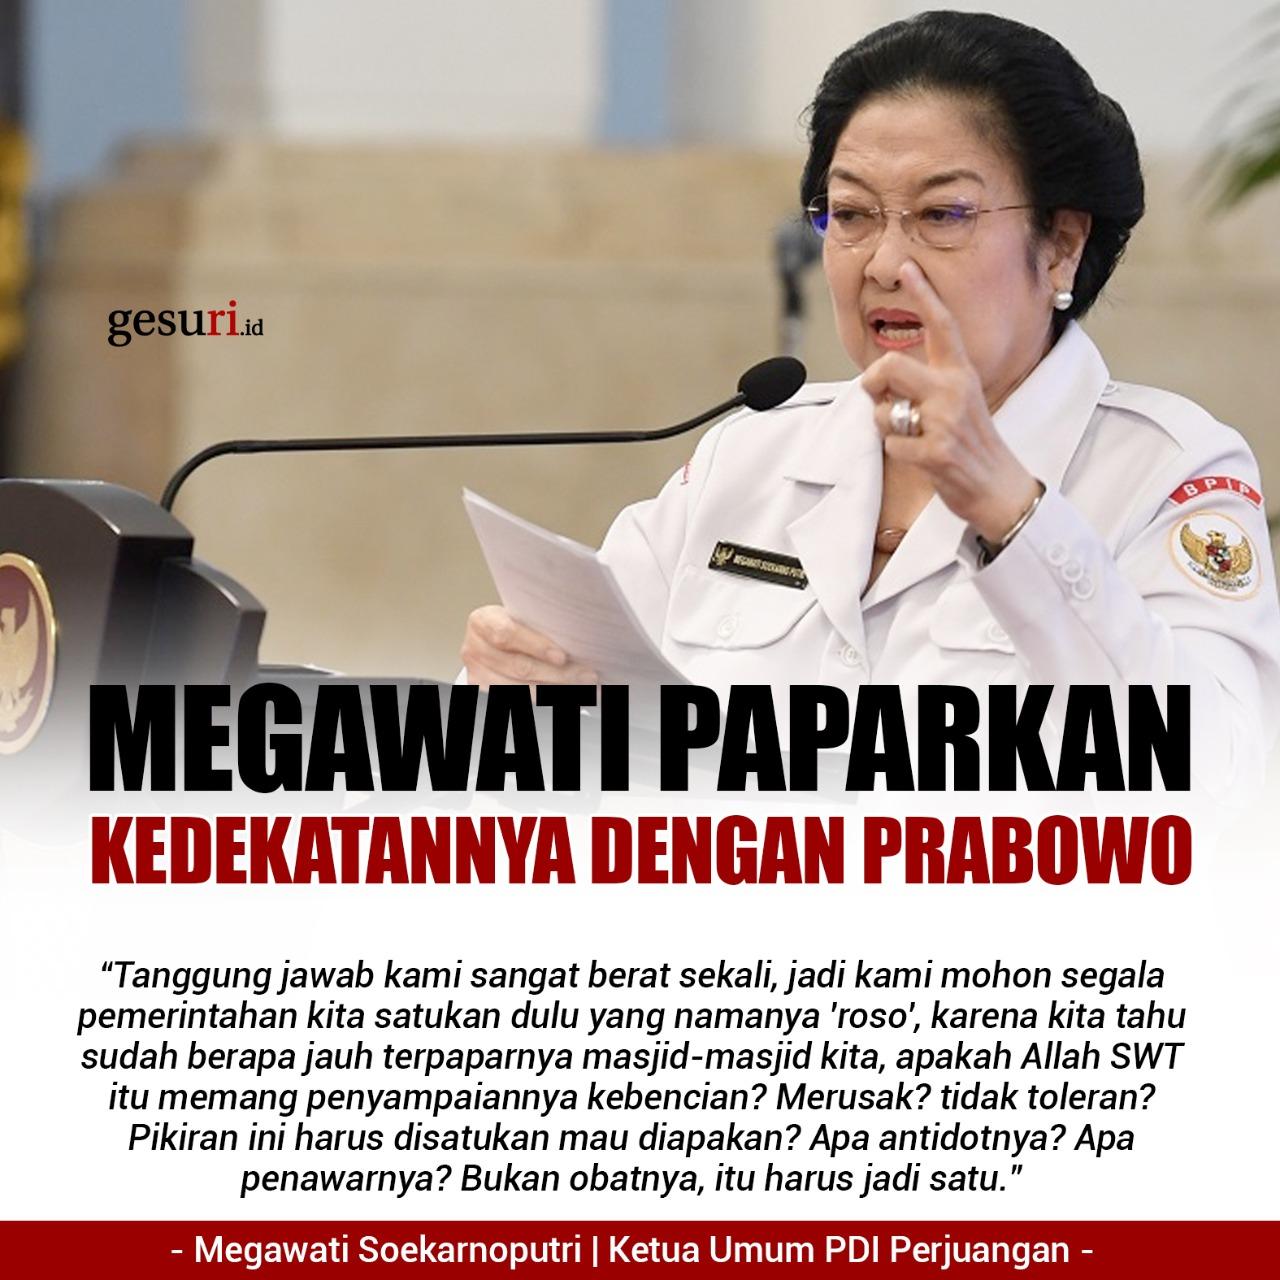 Megawati Soekarnoputri Paparkan Kedekatannya dengan Prabowo